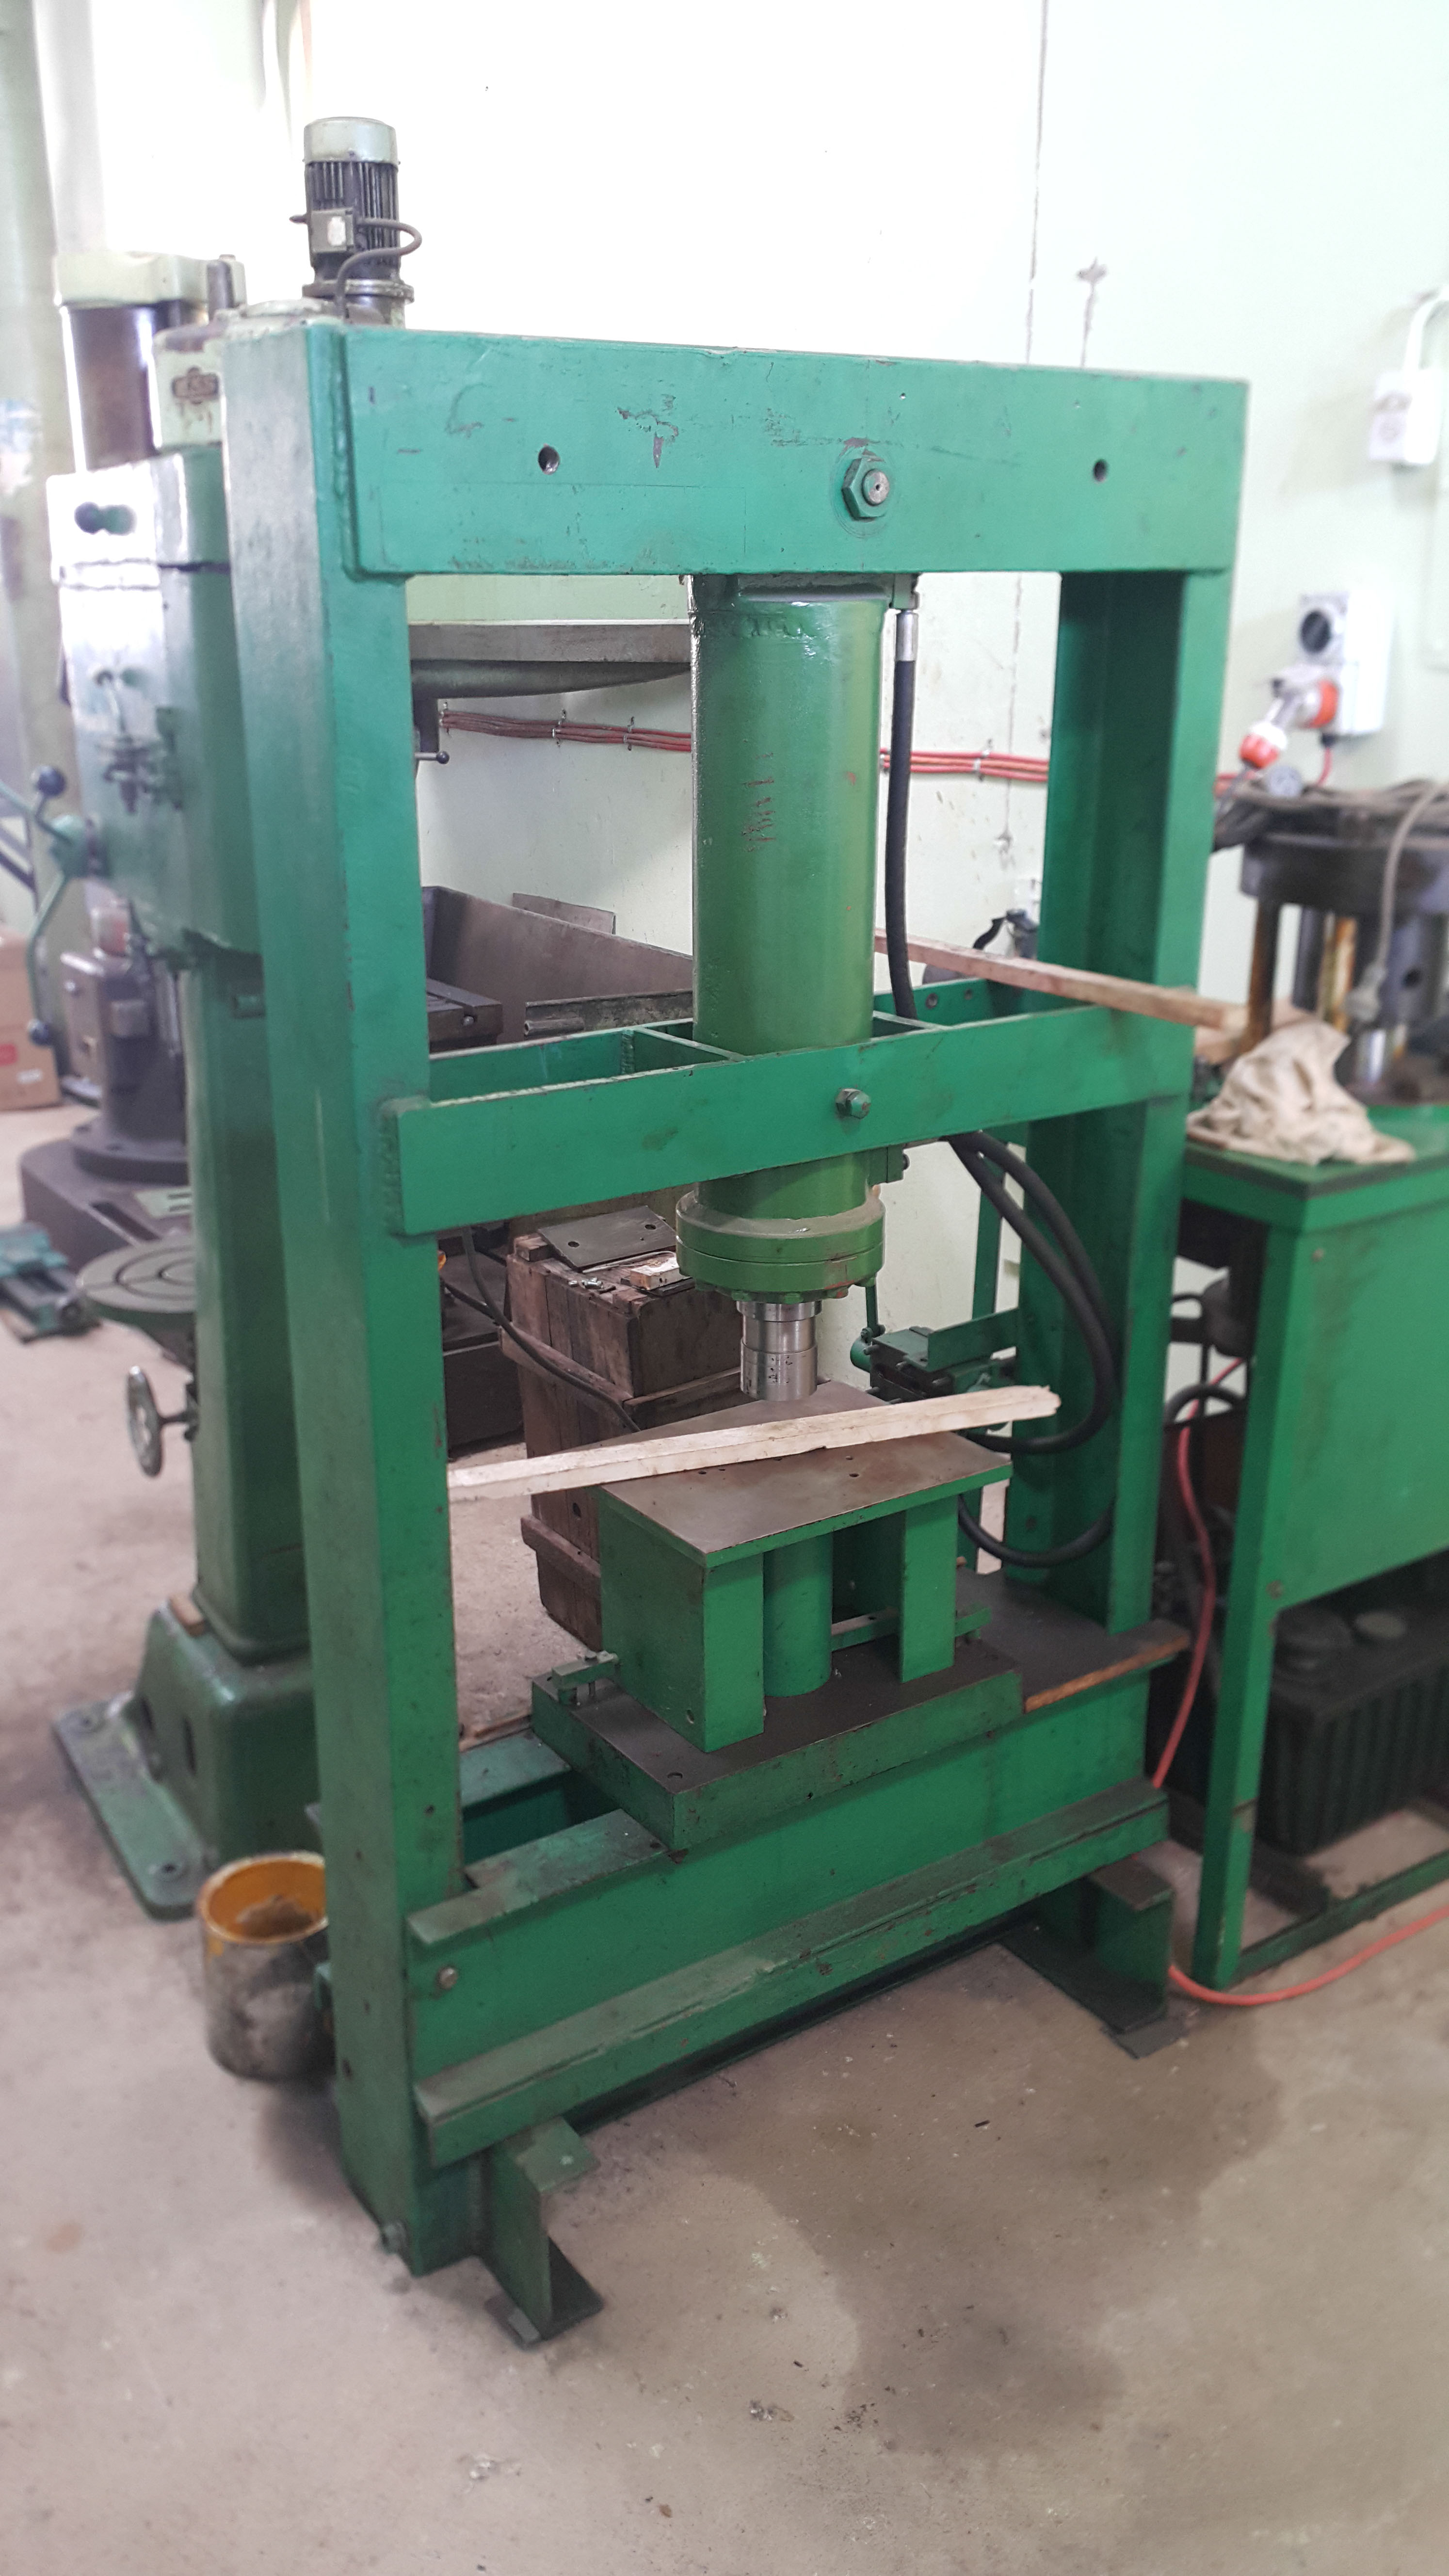 09 Hydraulic press and hose clamping machine